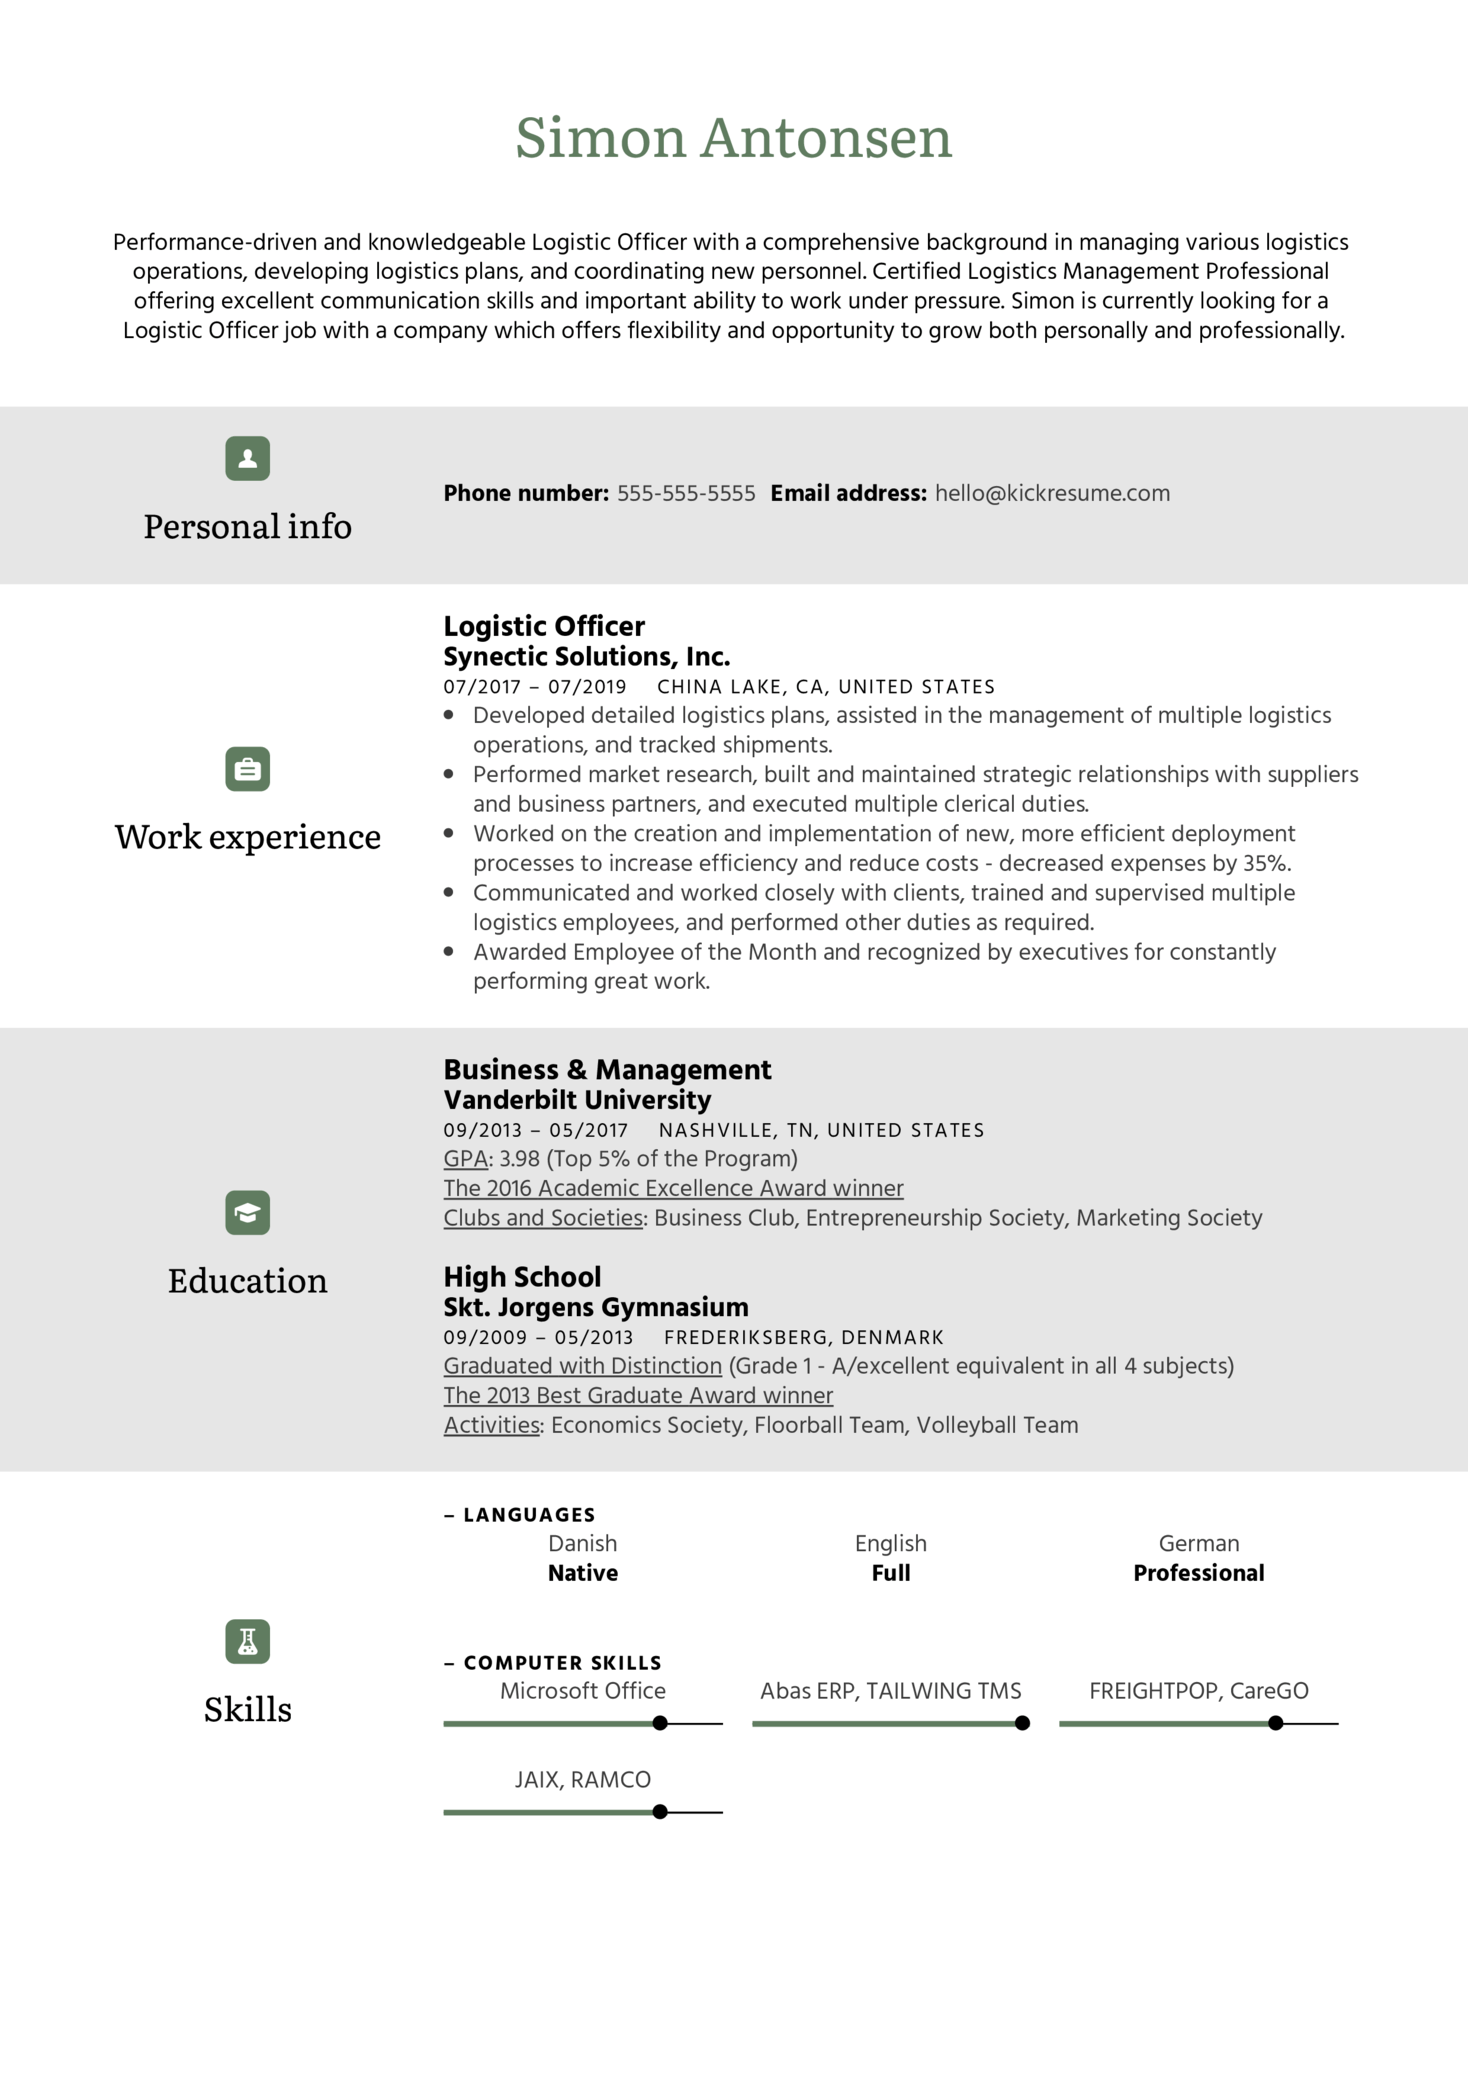 Logistic Officer Resume Sample (Part 1)